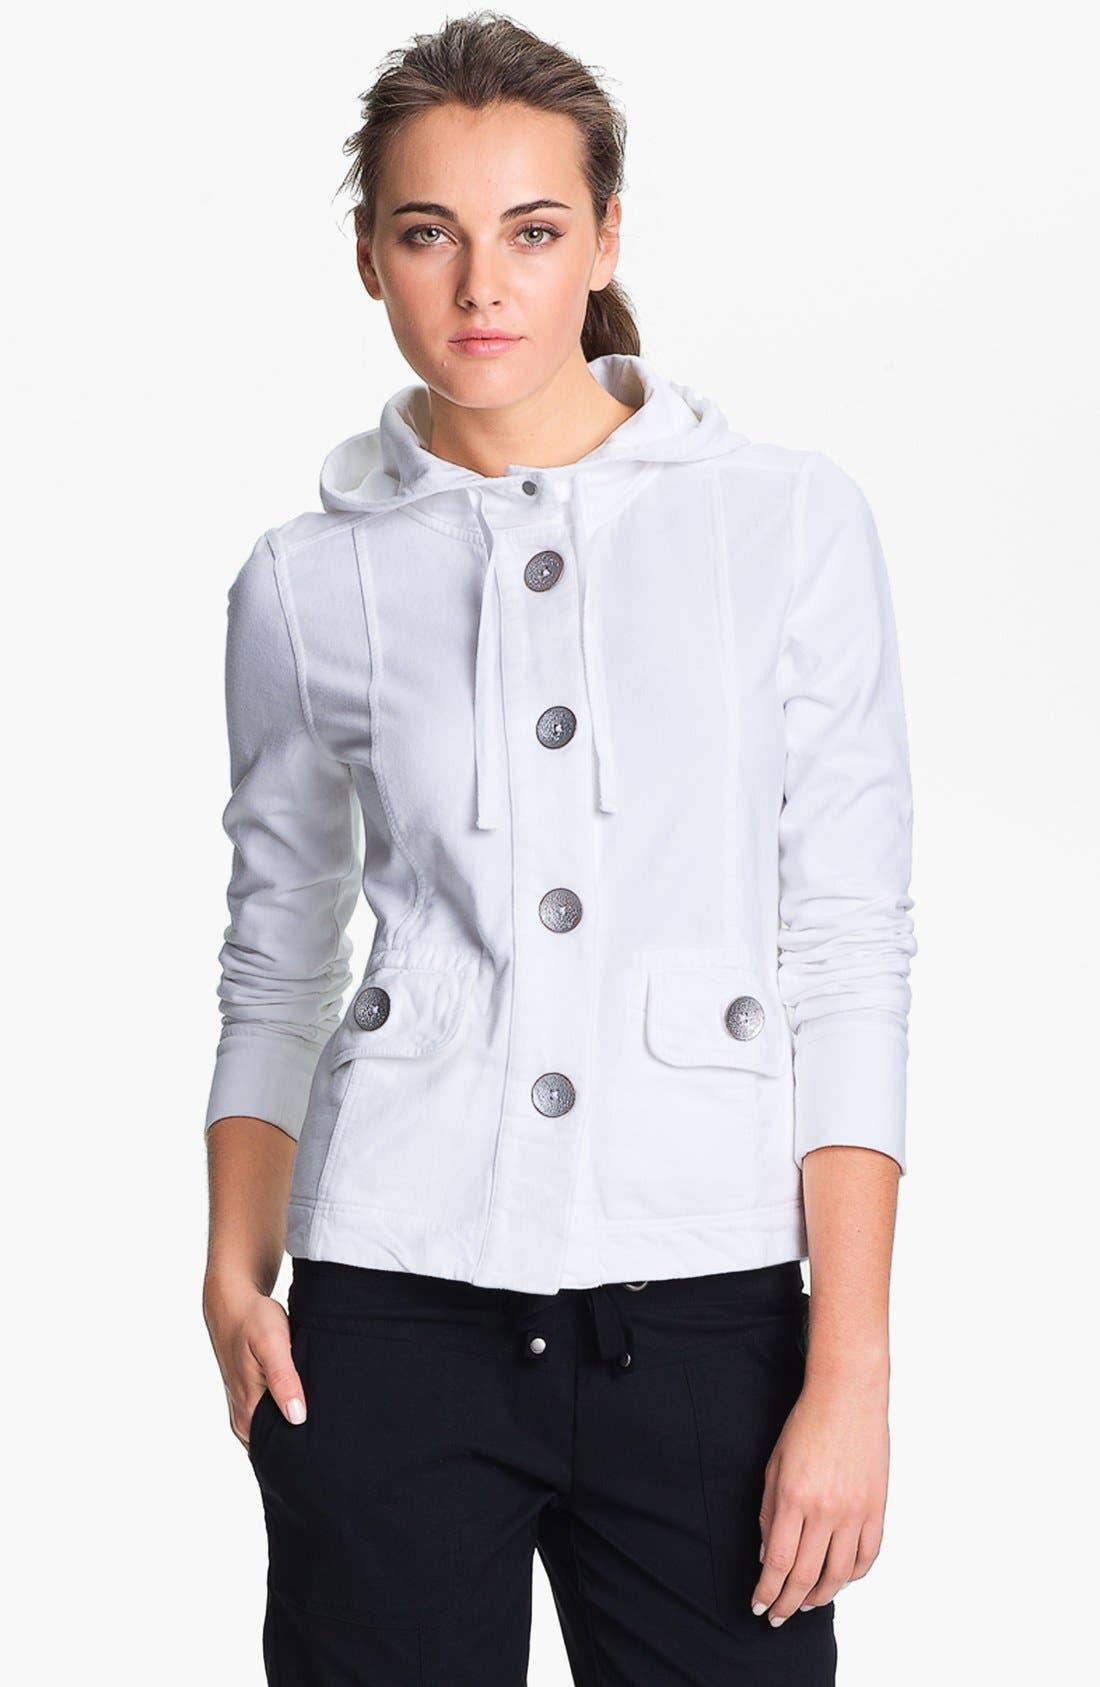 Alternate Image 1 Selected - prAna 'Janelle' Jacket